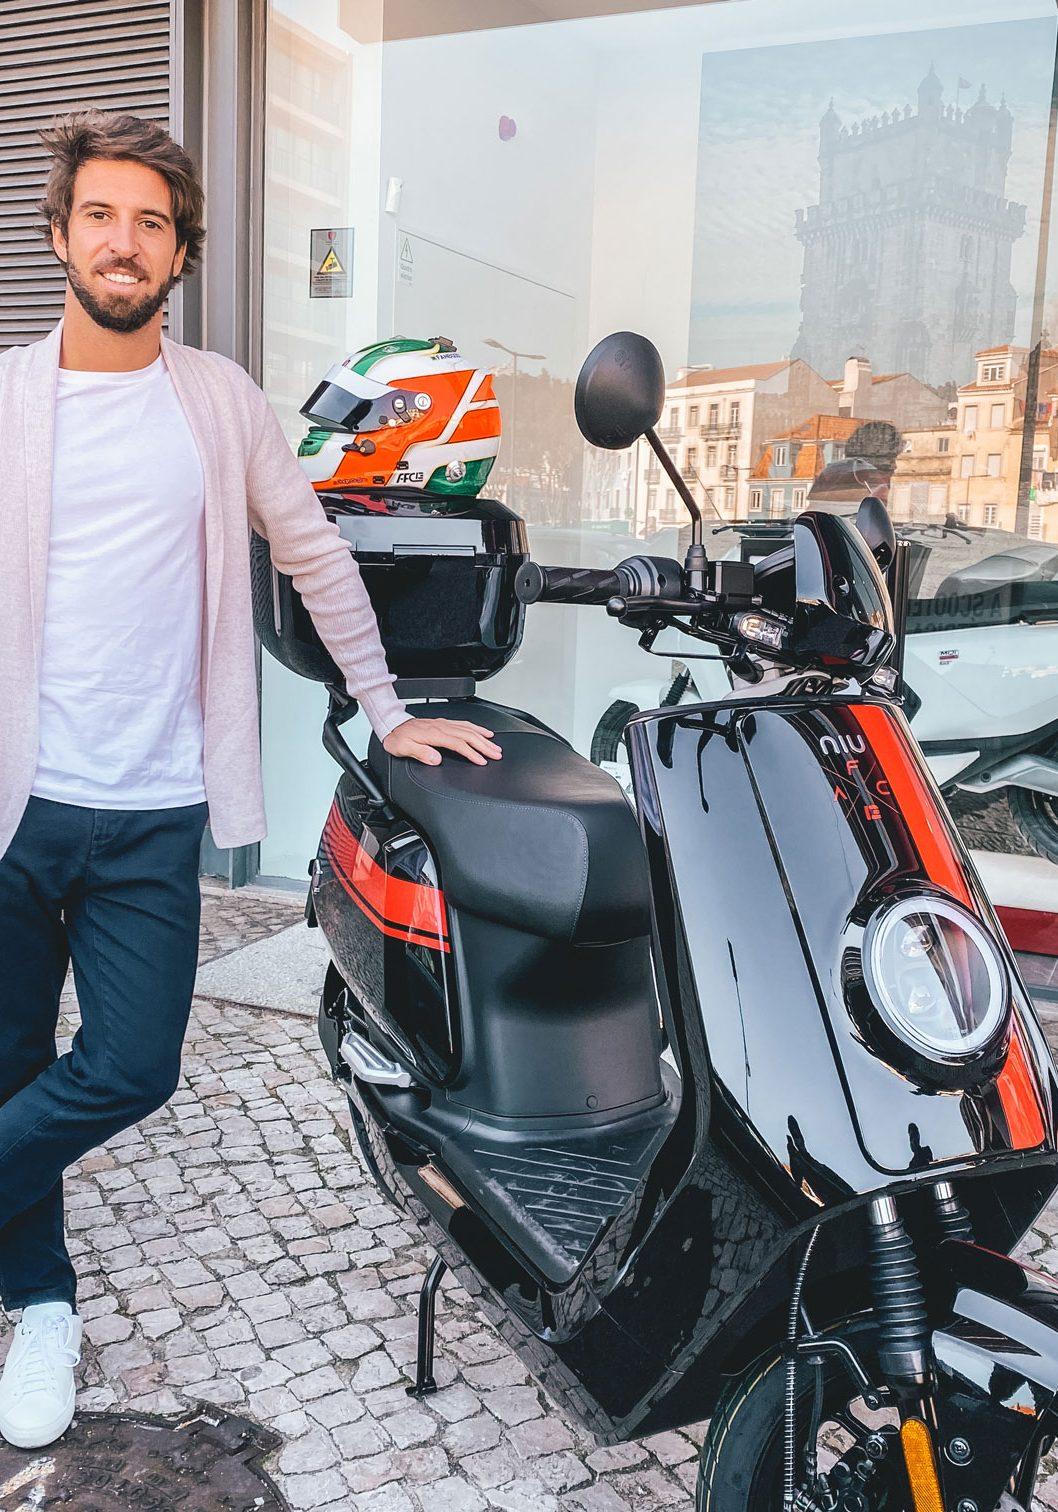 Antonio Felix da Costa stands proudly next to his NIU scooter